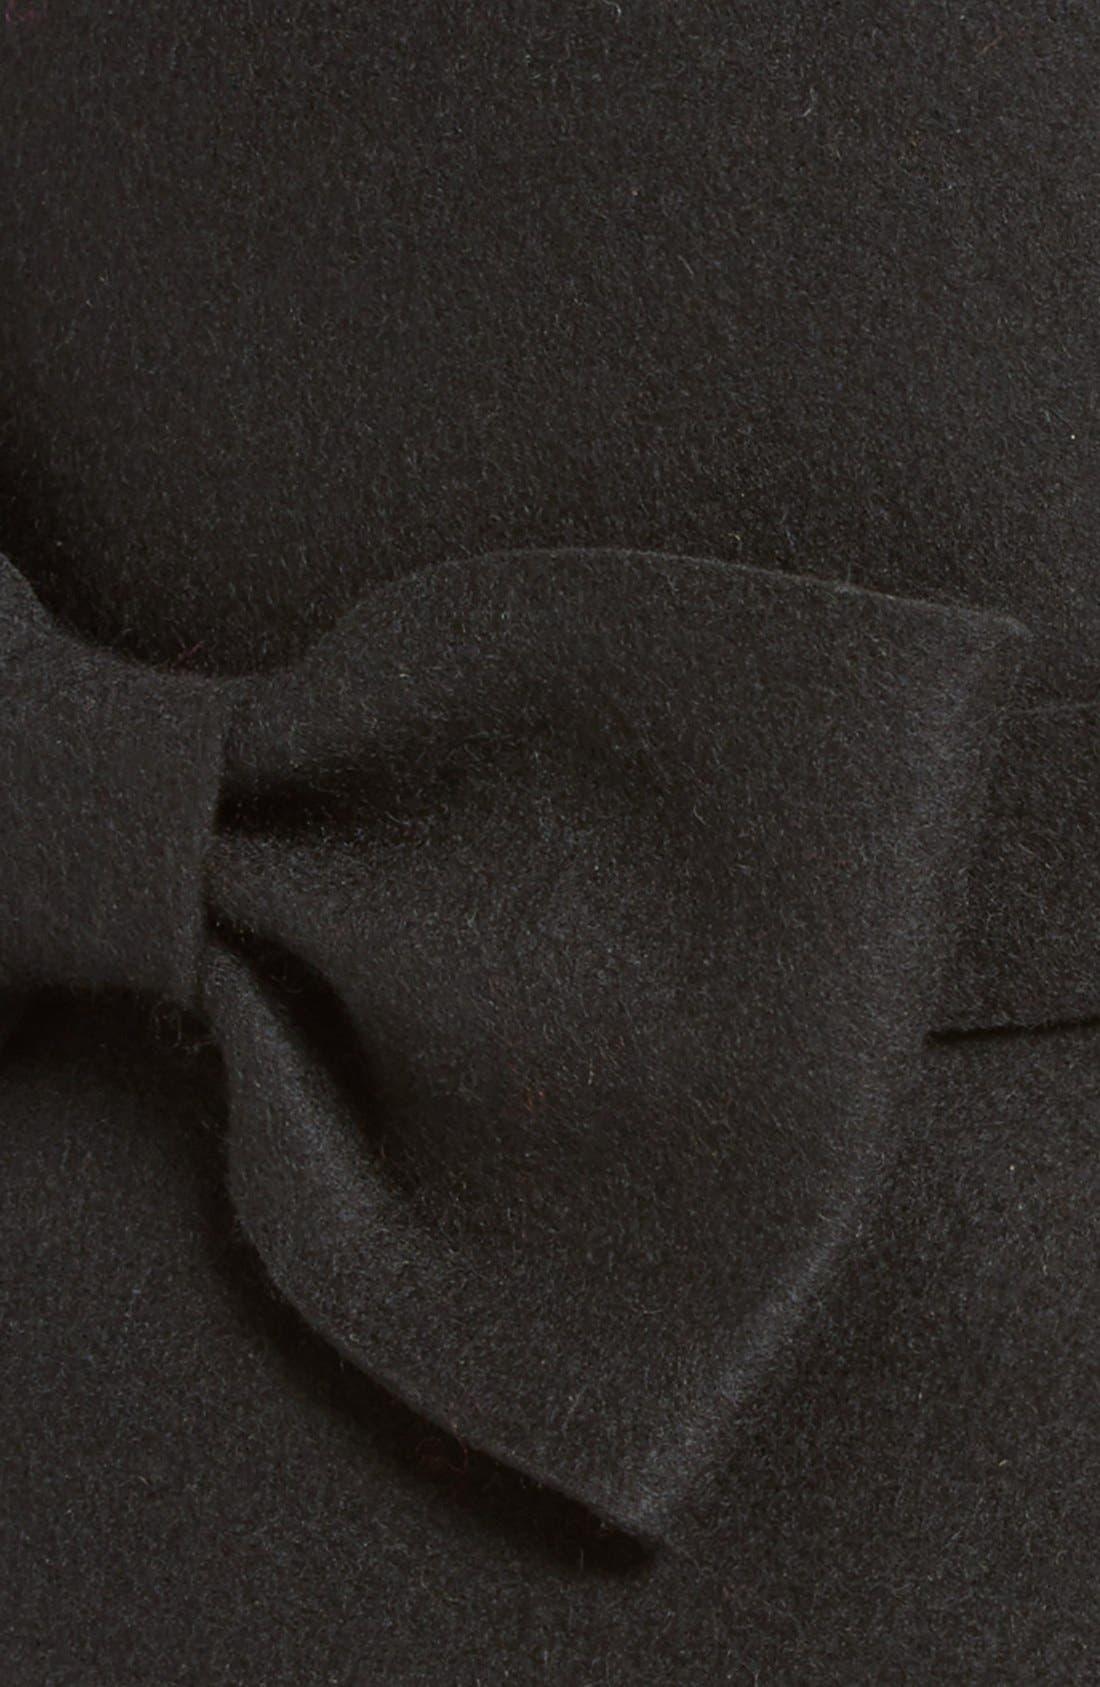 katespade new yorkfelted wool downbrimhat,                             Alternate thumbnail 2, color,                             001